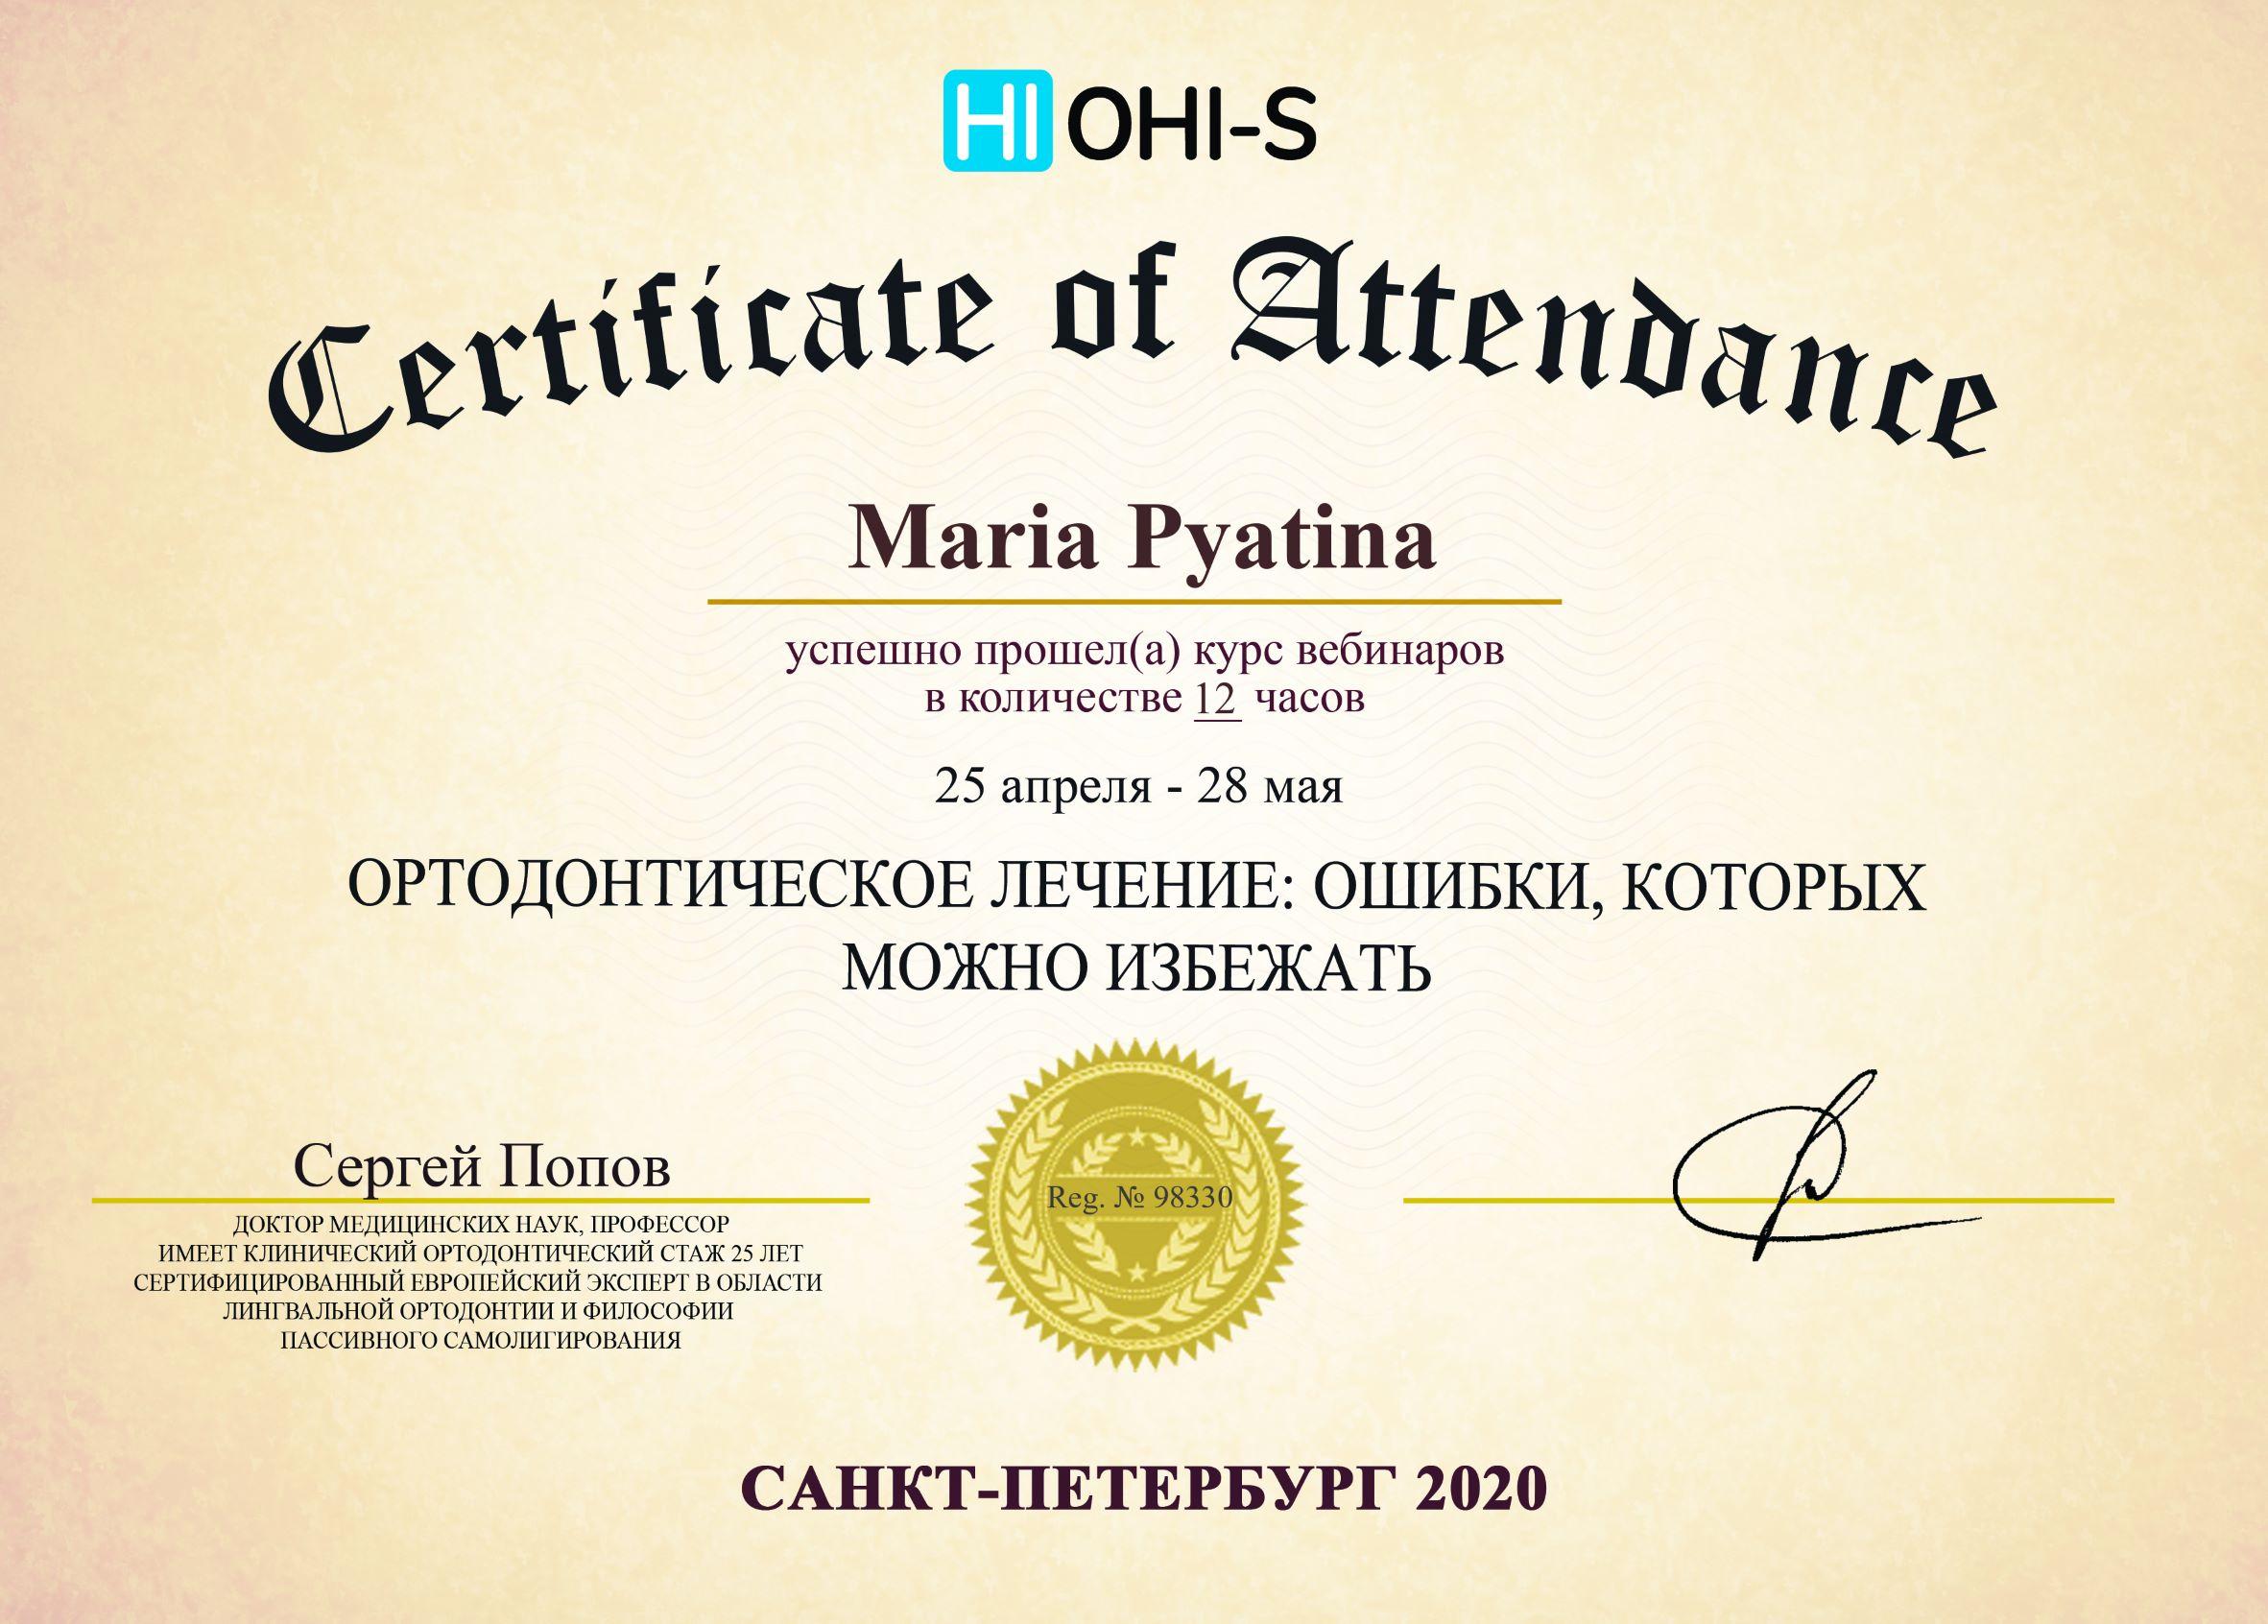 2020, HI OHI-S, Санкт-Петербург